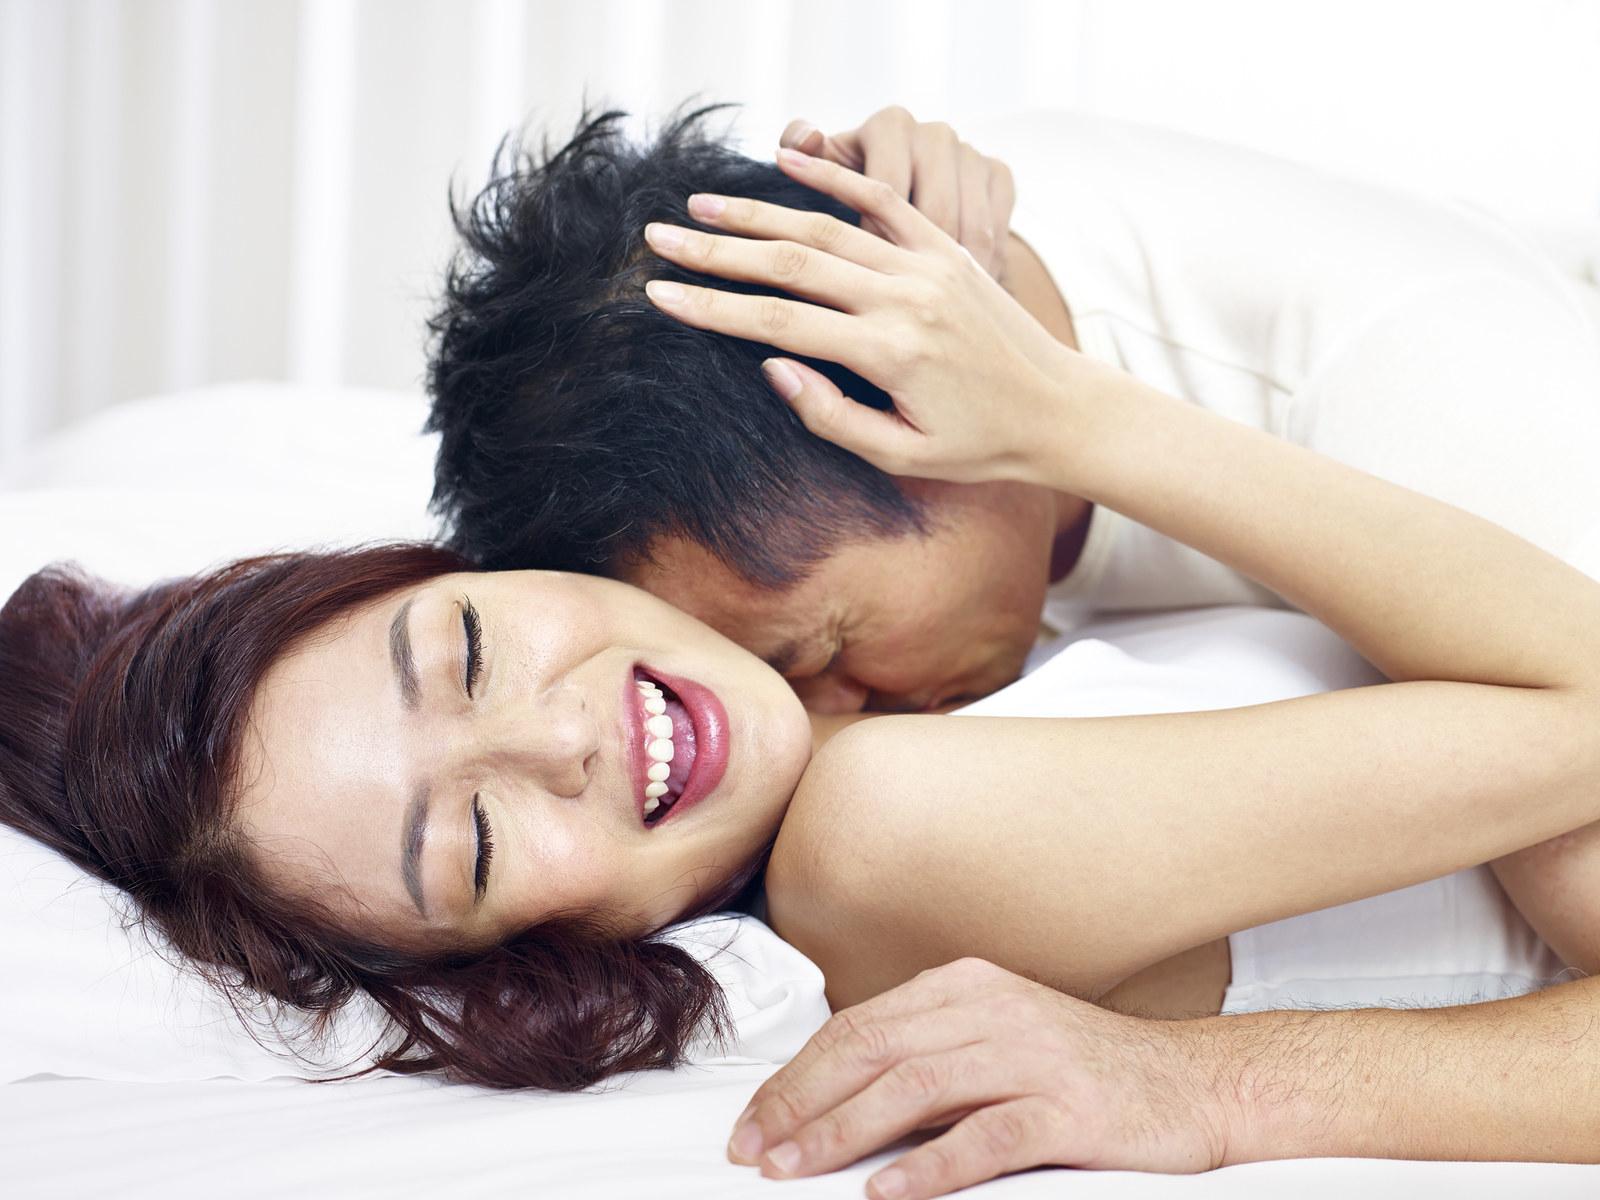 Girls sex photos in hospital